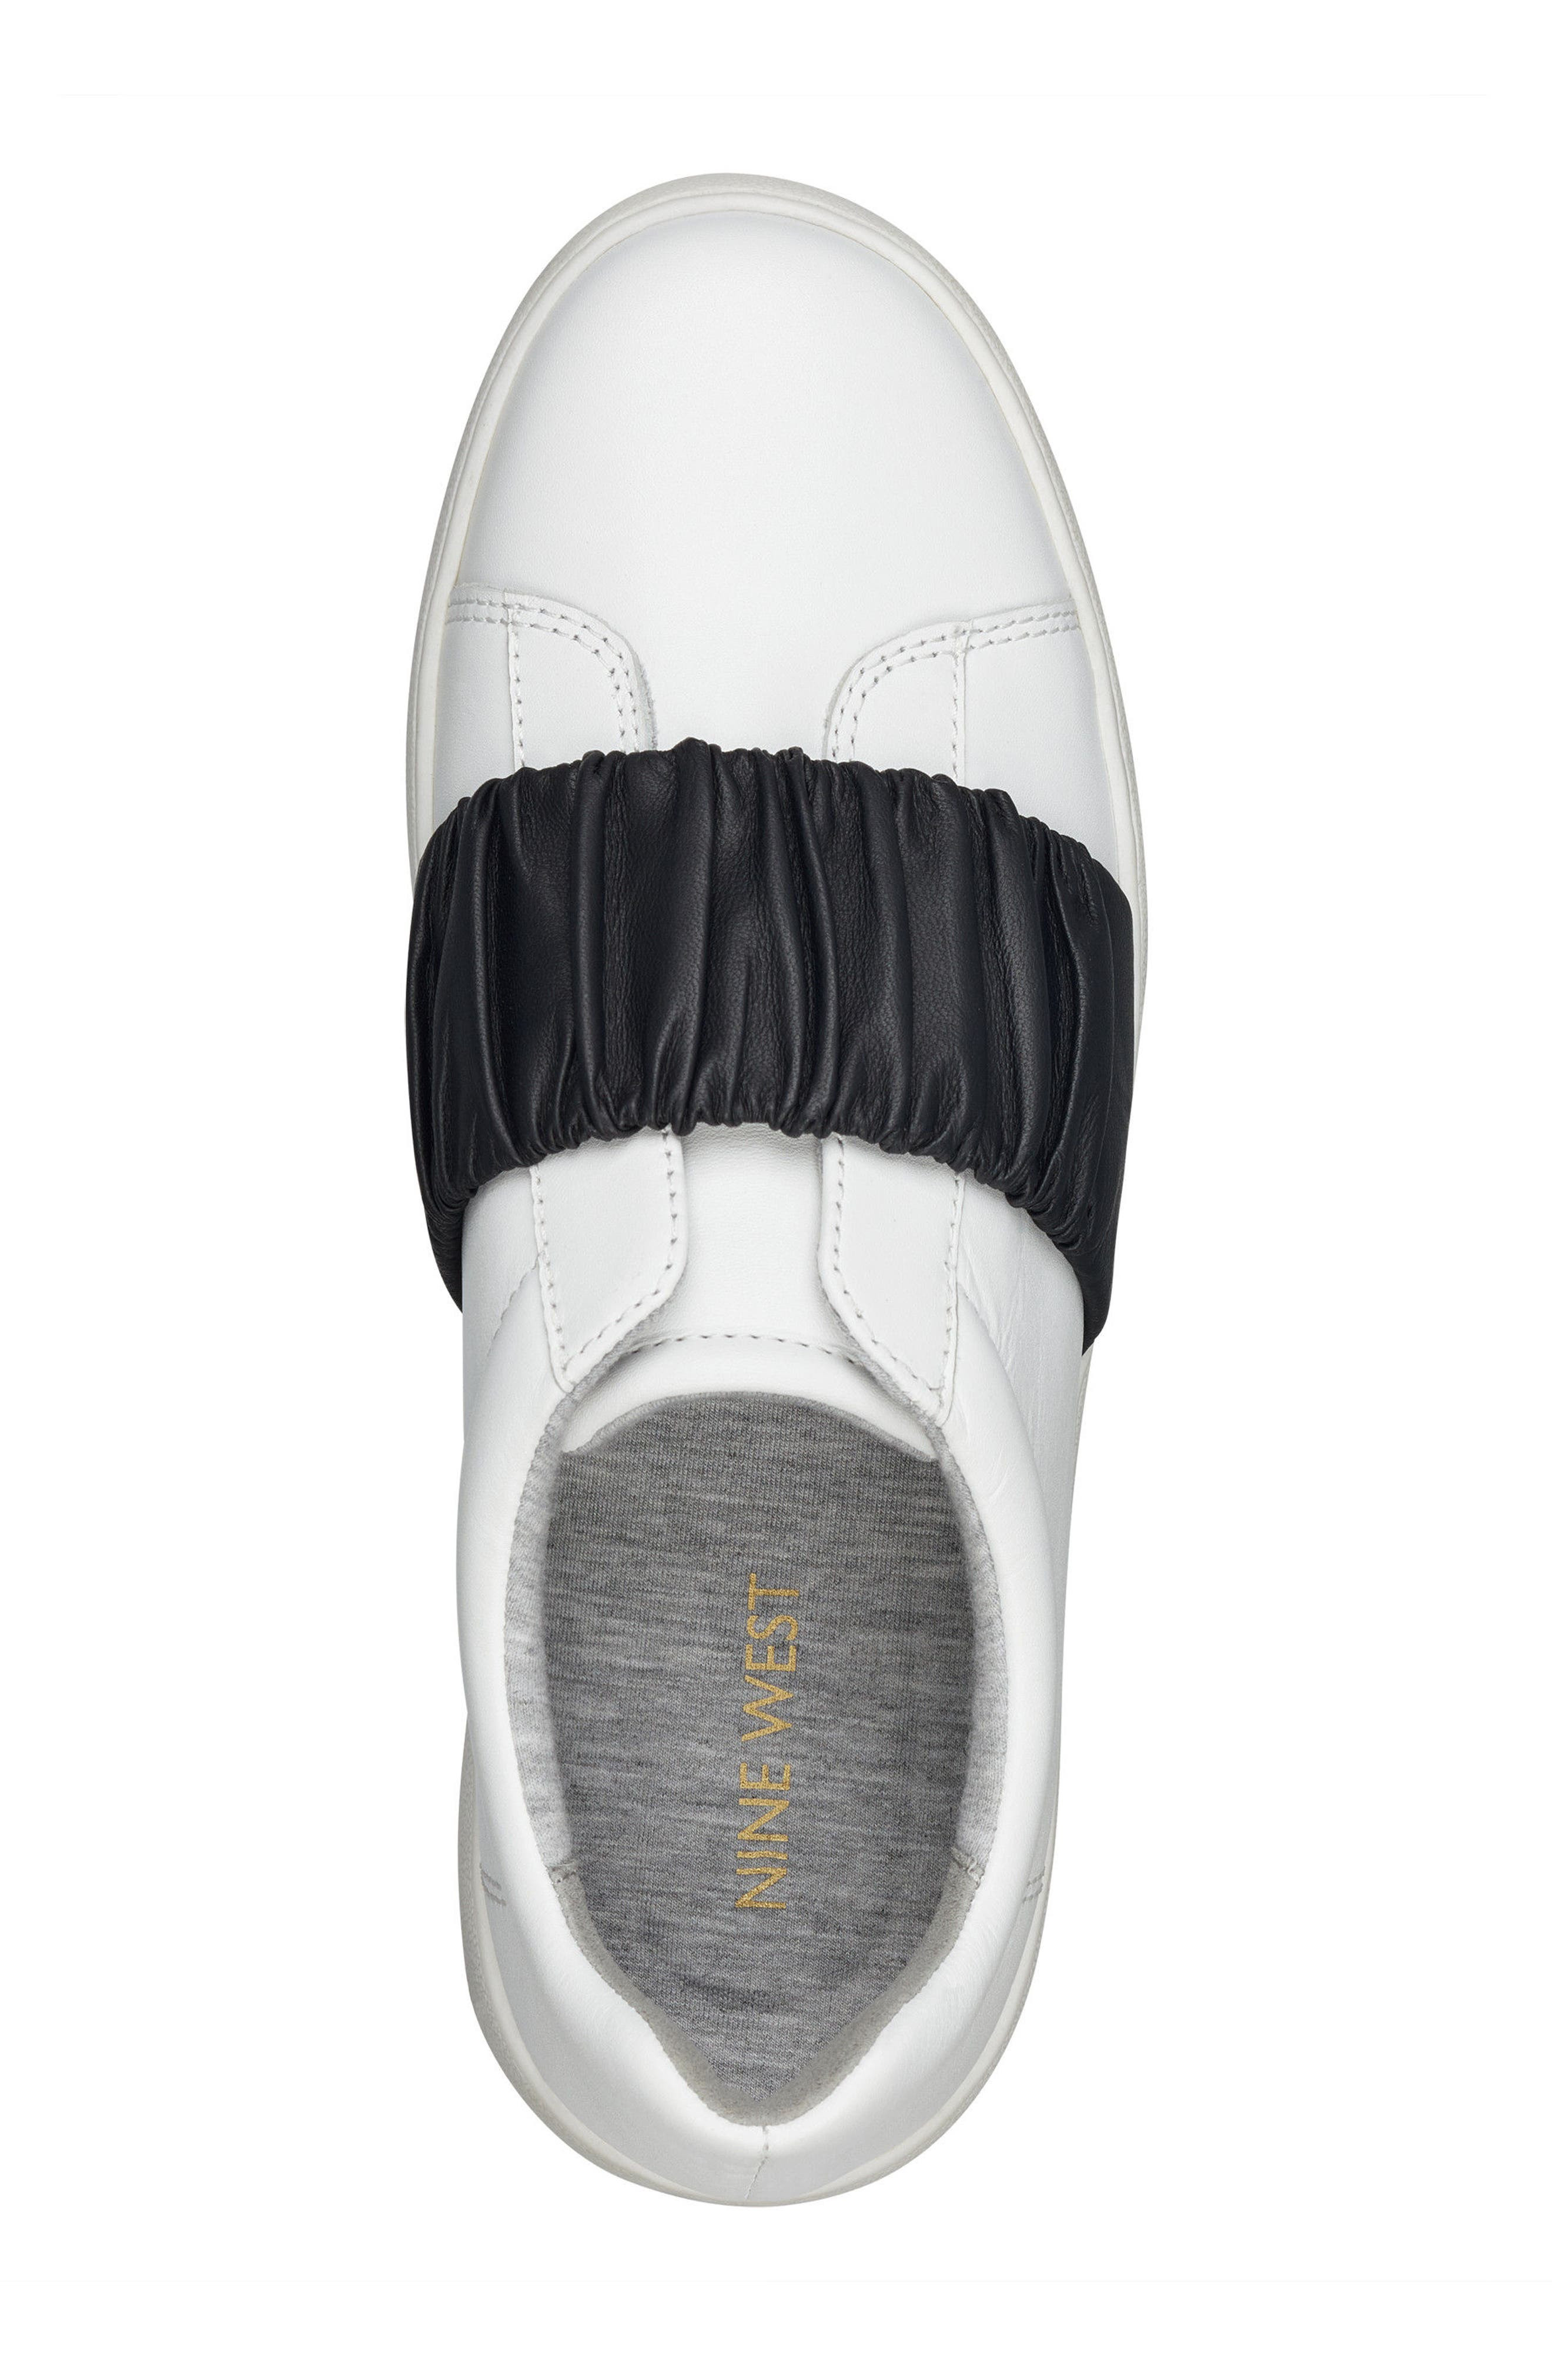 Pindiviah Slip-On Sneaker,                             Alternate thumbnail 5, color,                             White/ Black Leather